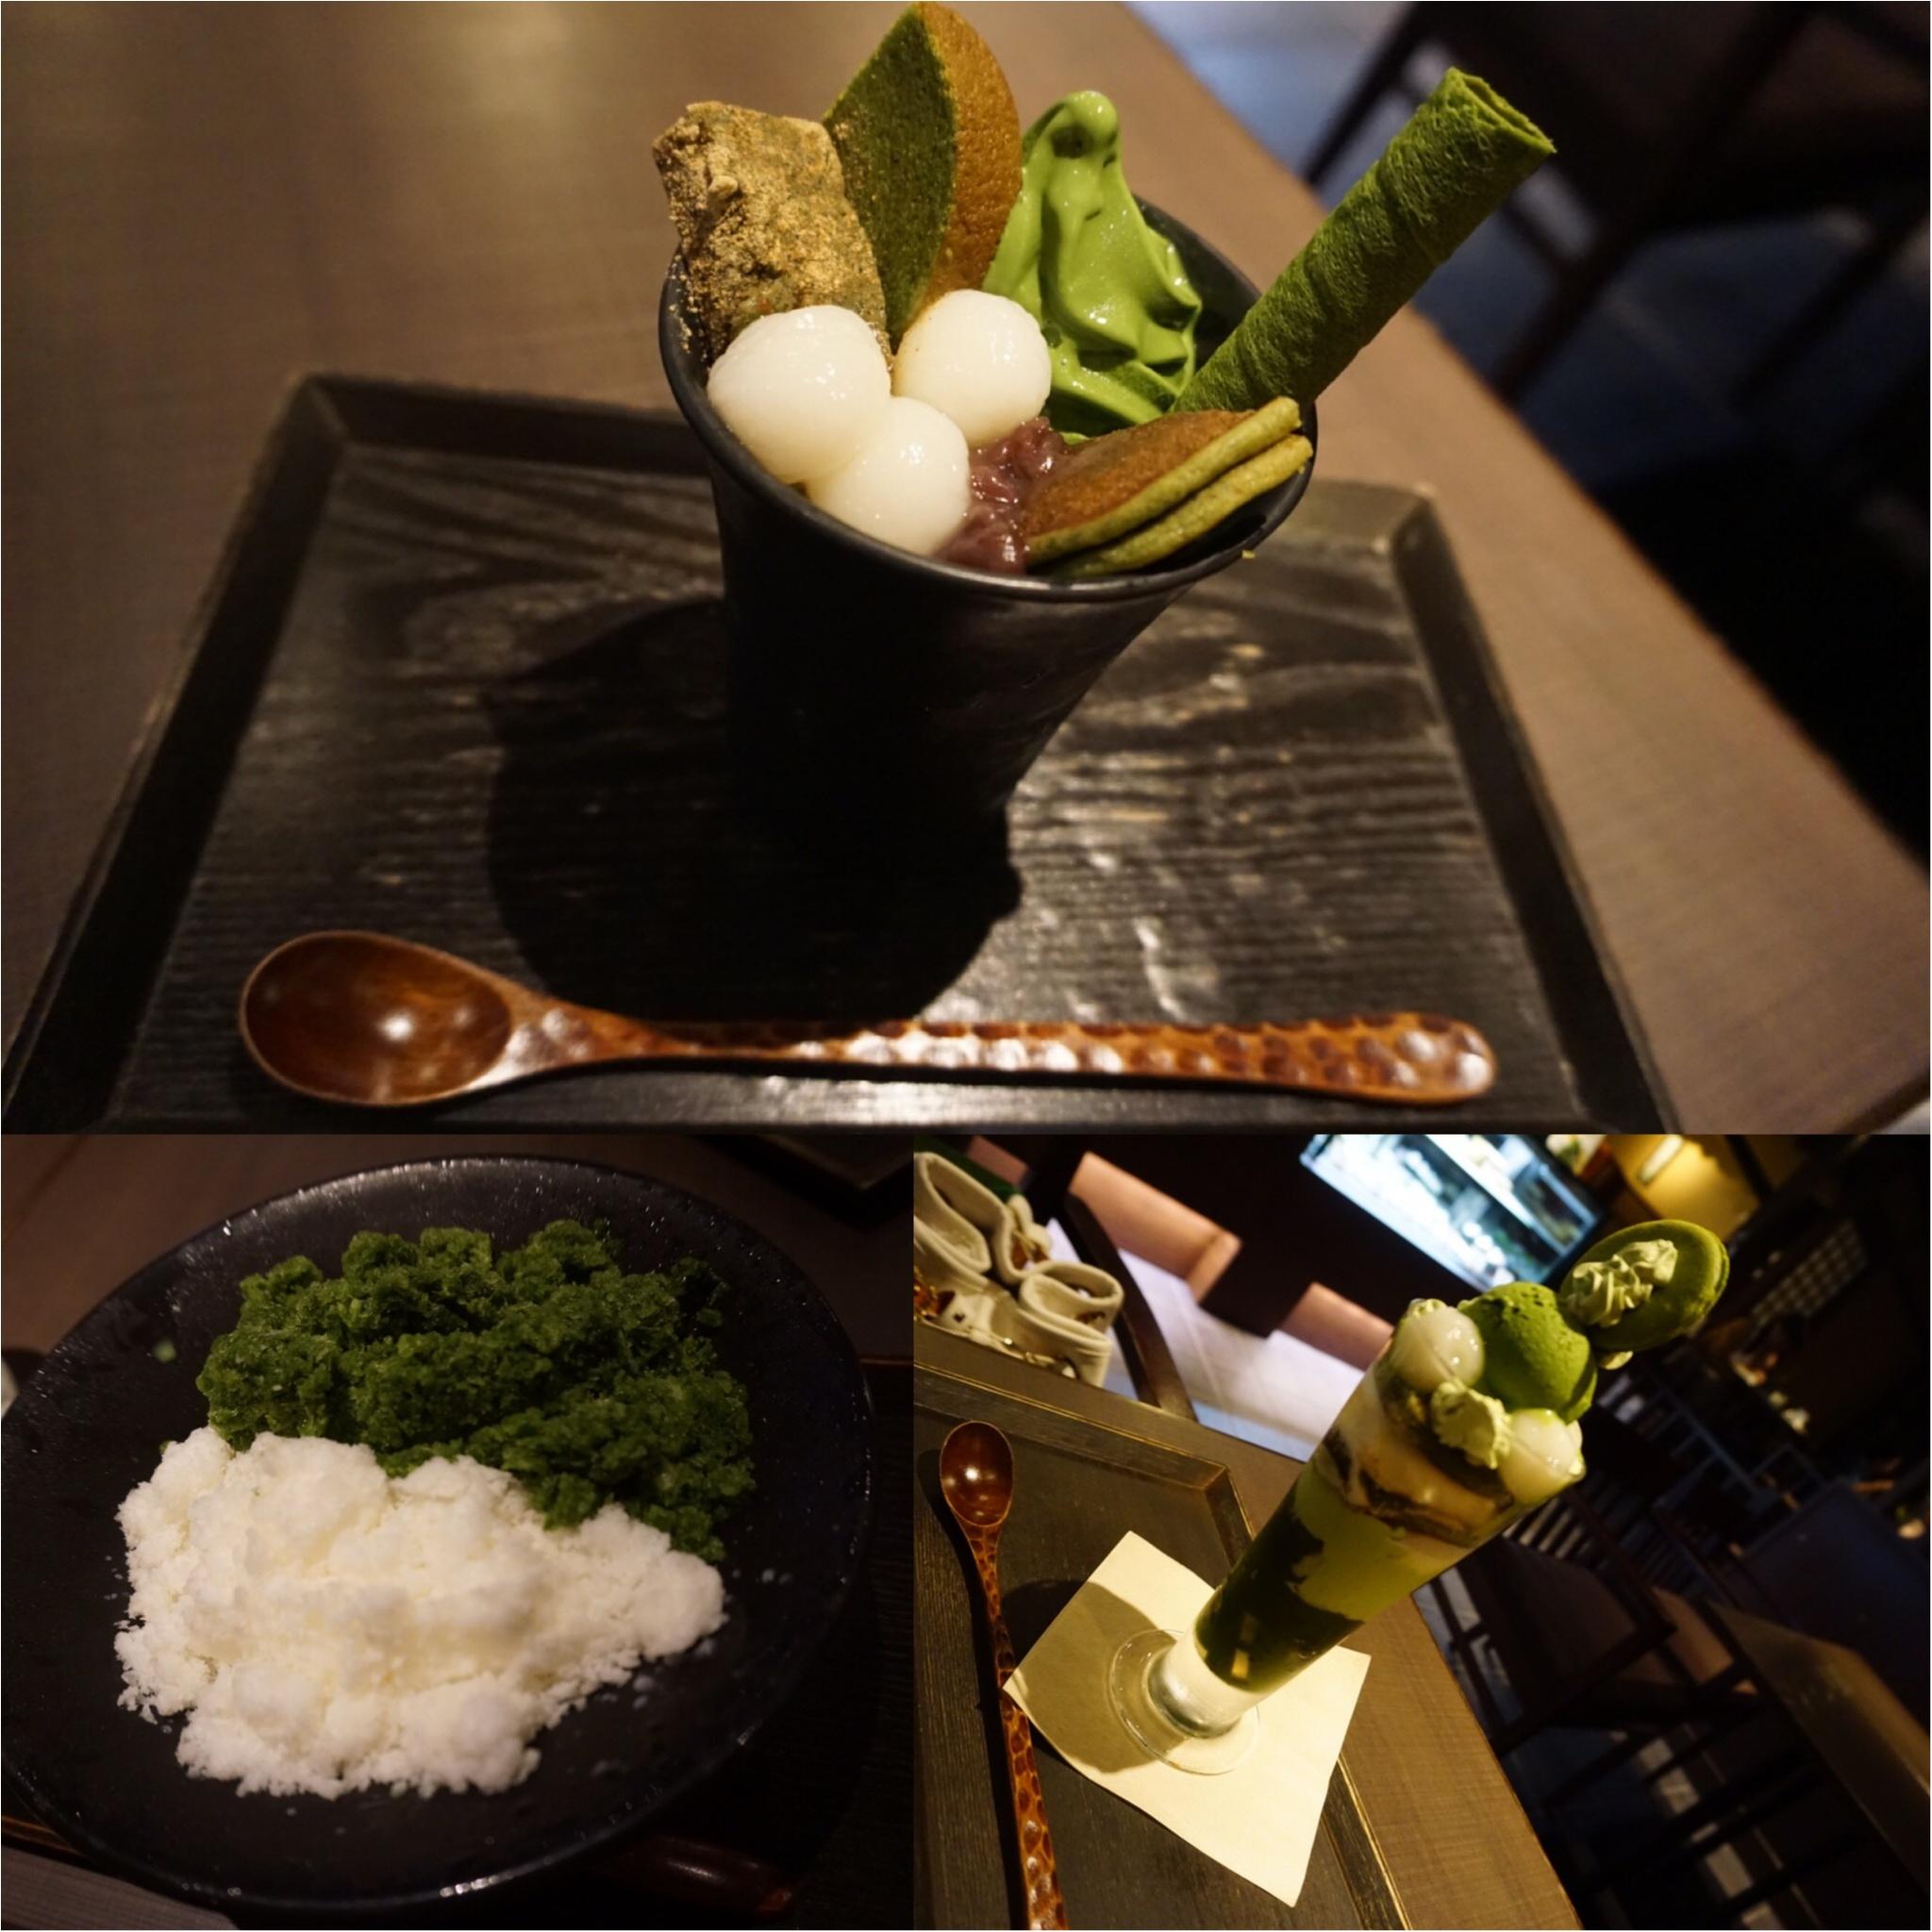 ☺︎♡京都〜抹茶巡りの旅〜わらび餅&パフェ&茶蕎麦_4